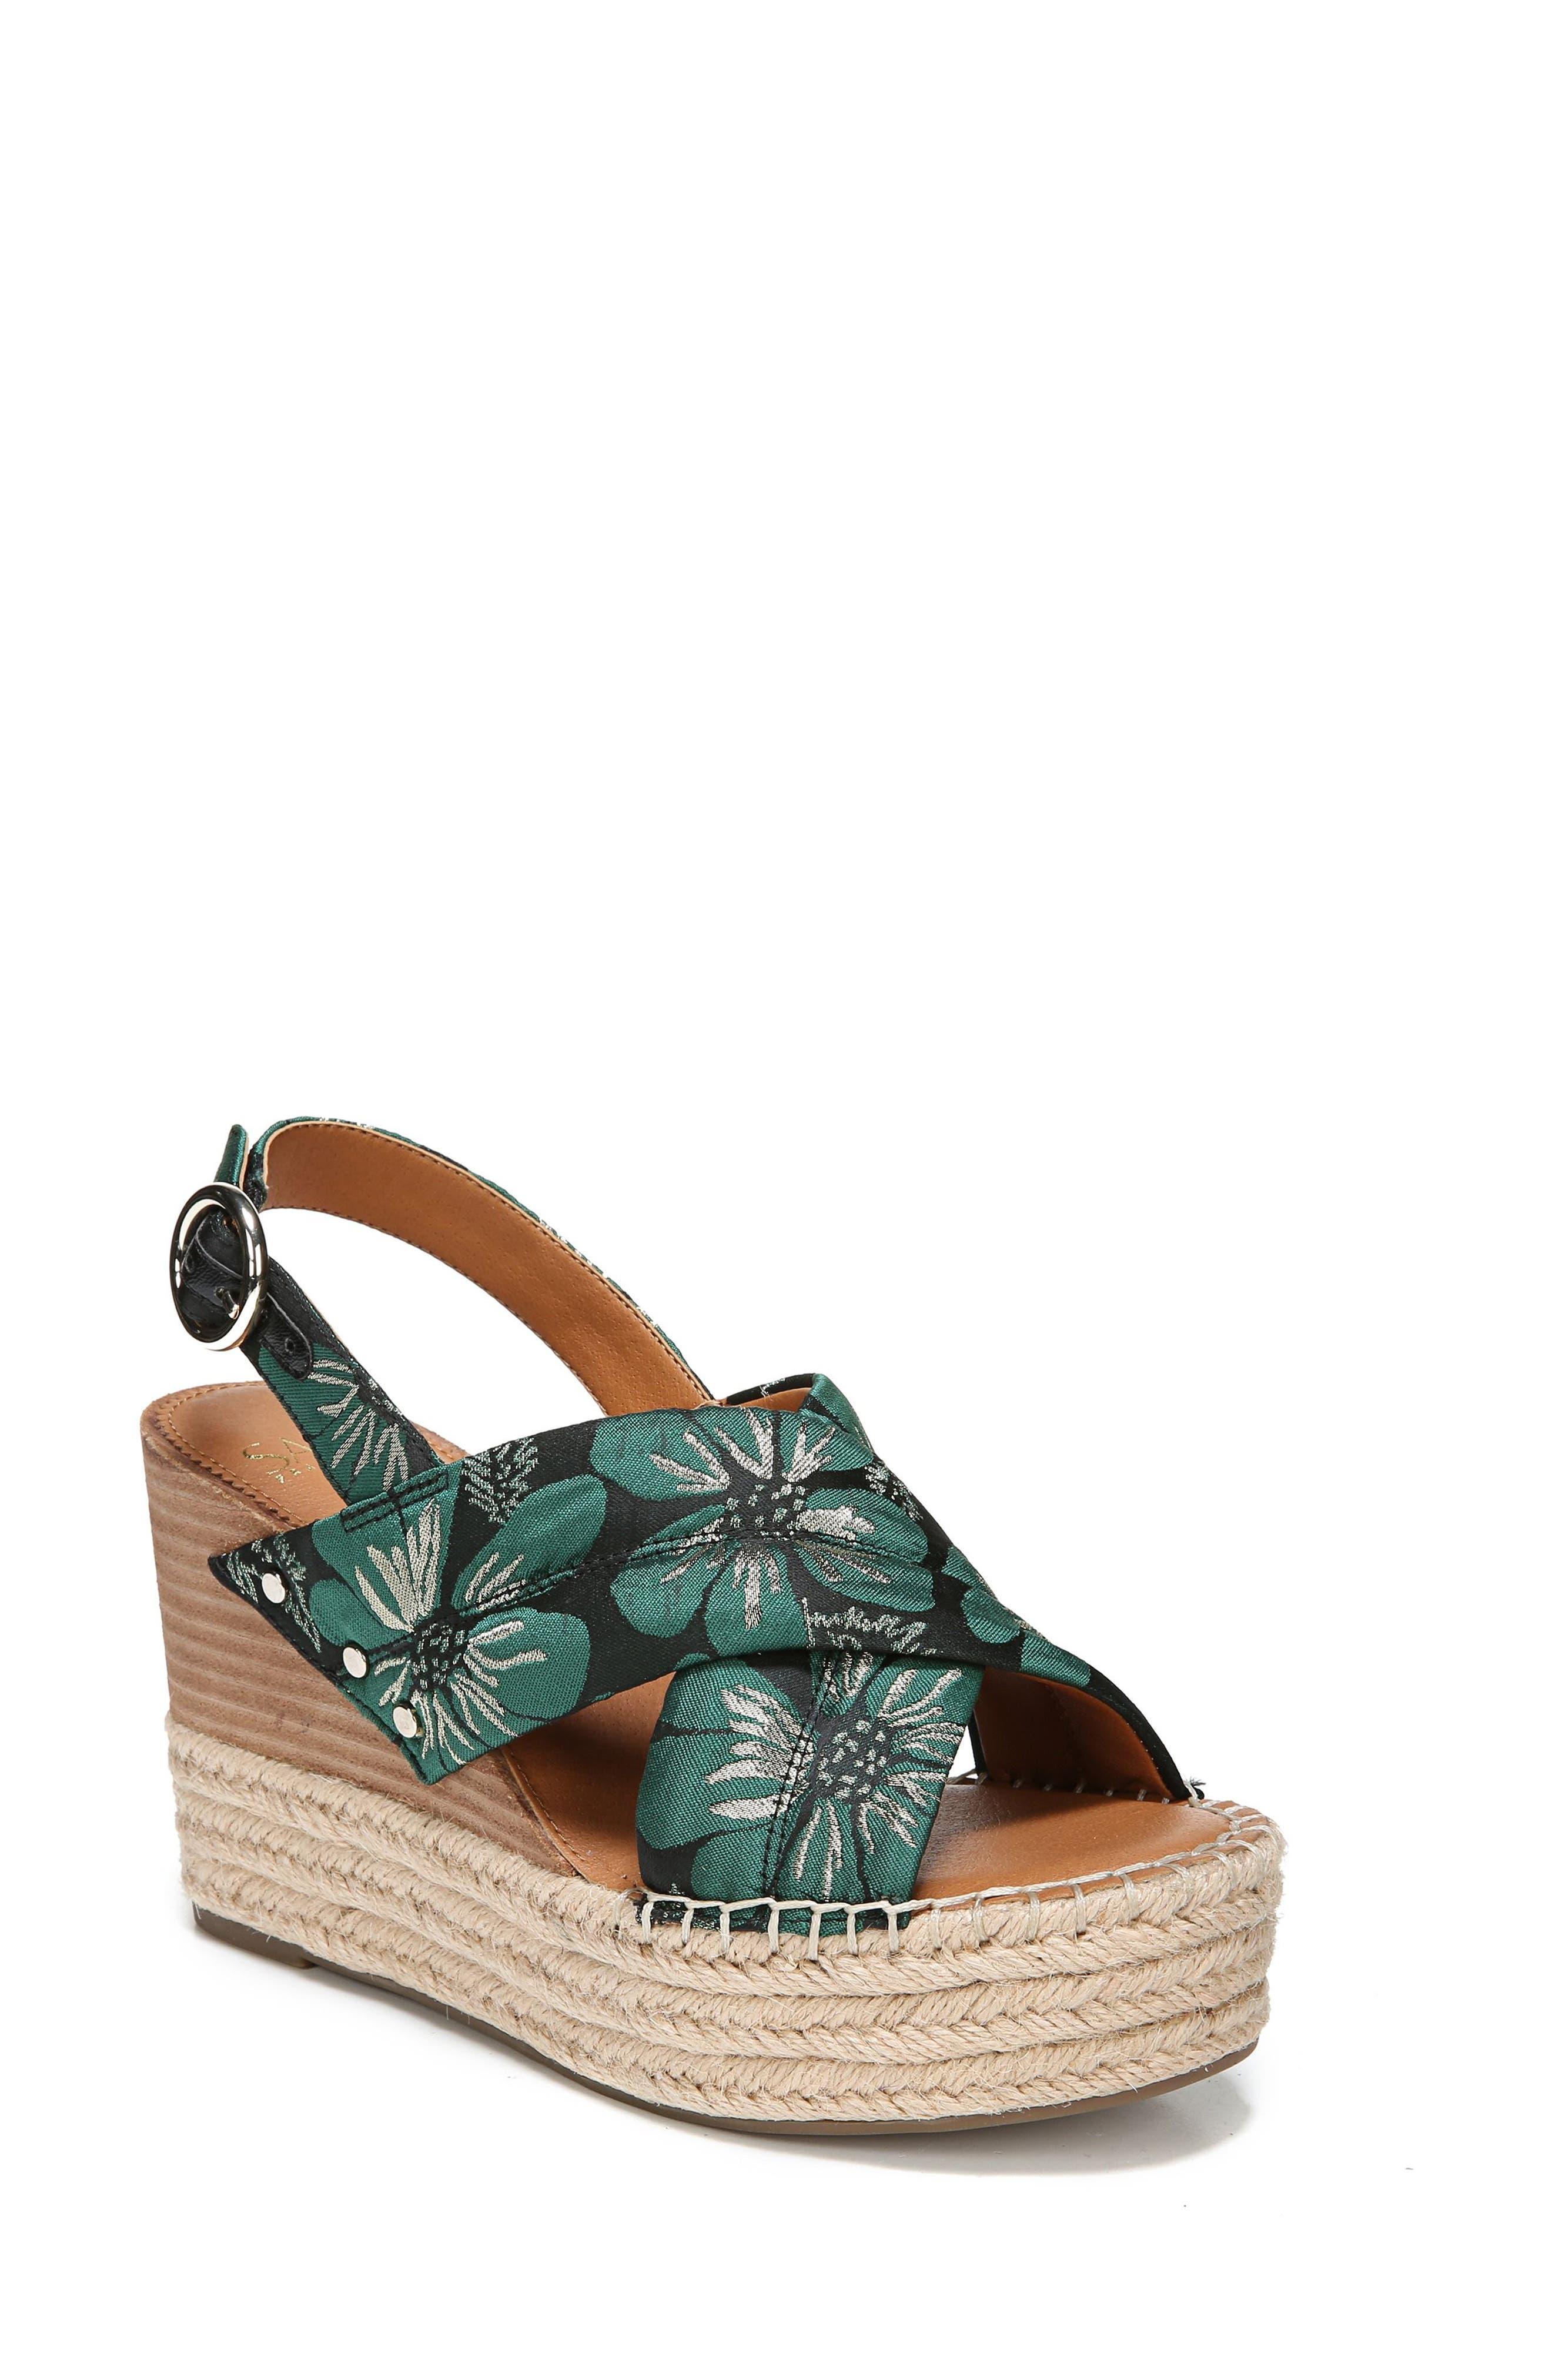 Niva Espadrille Wedge Sandal,                             Main thumbnail 3, color,